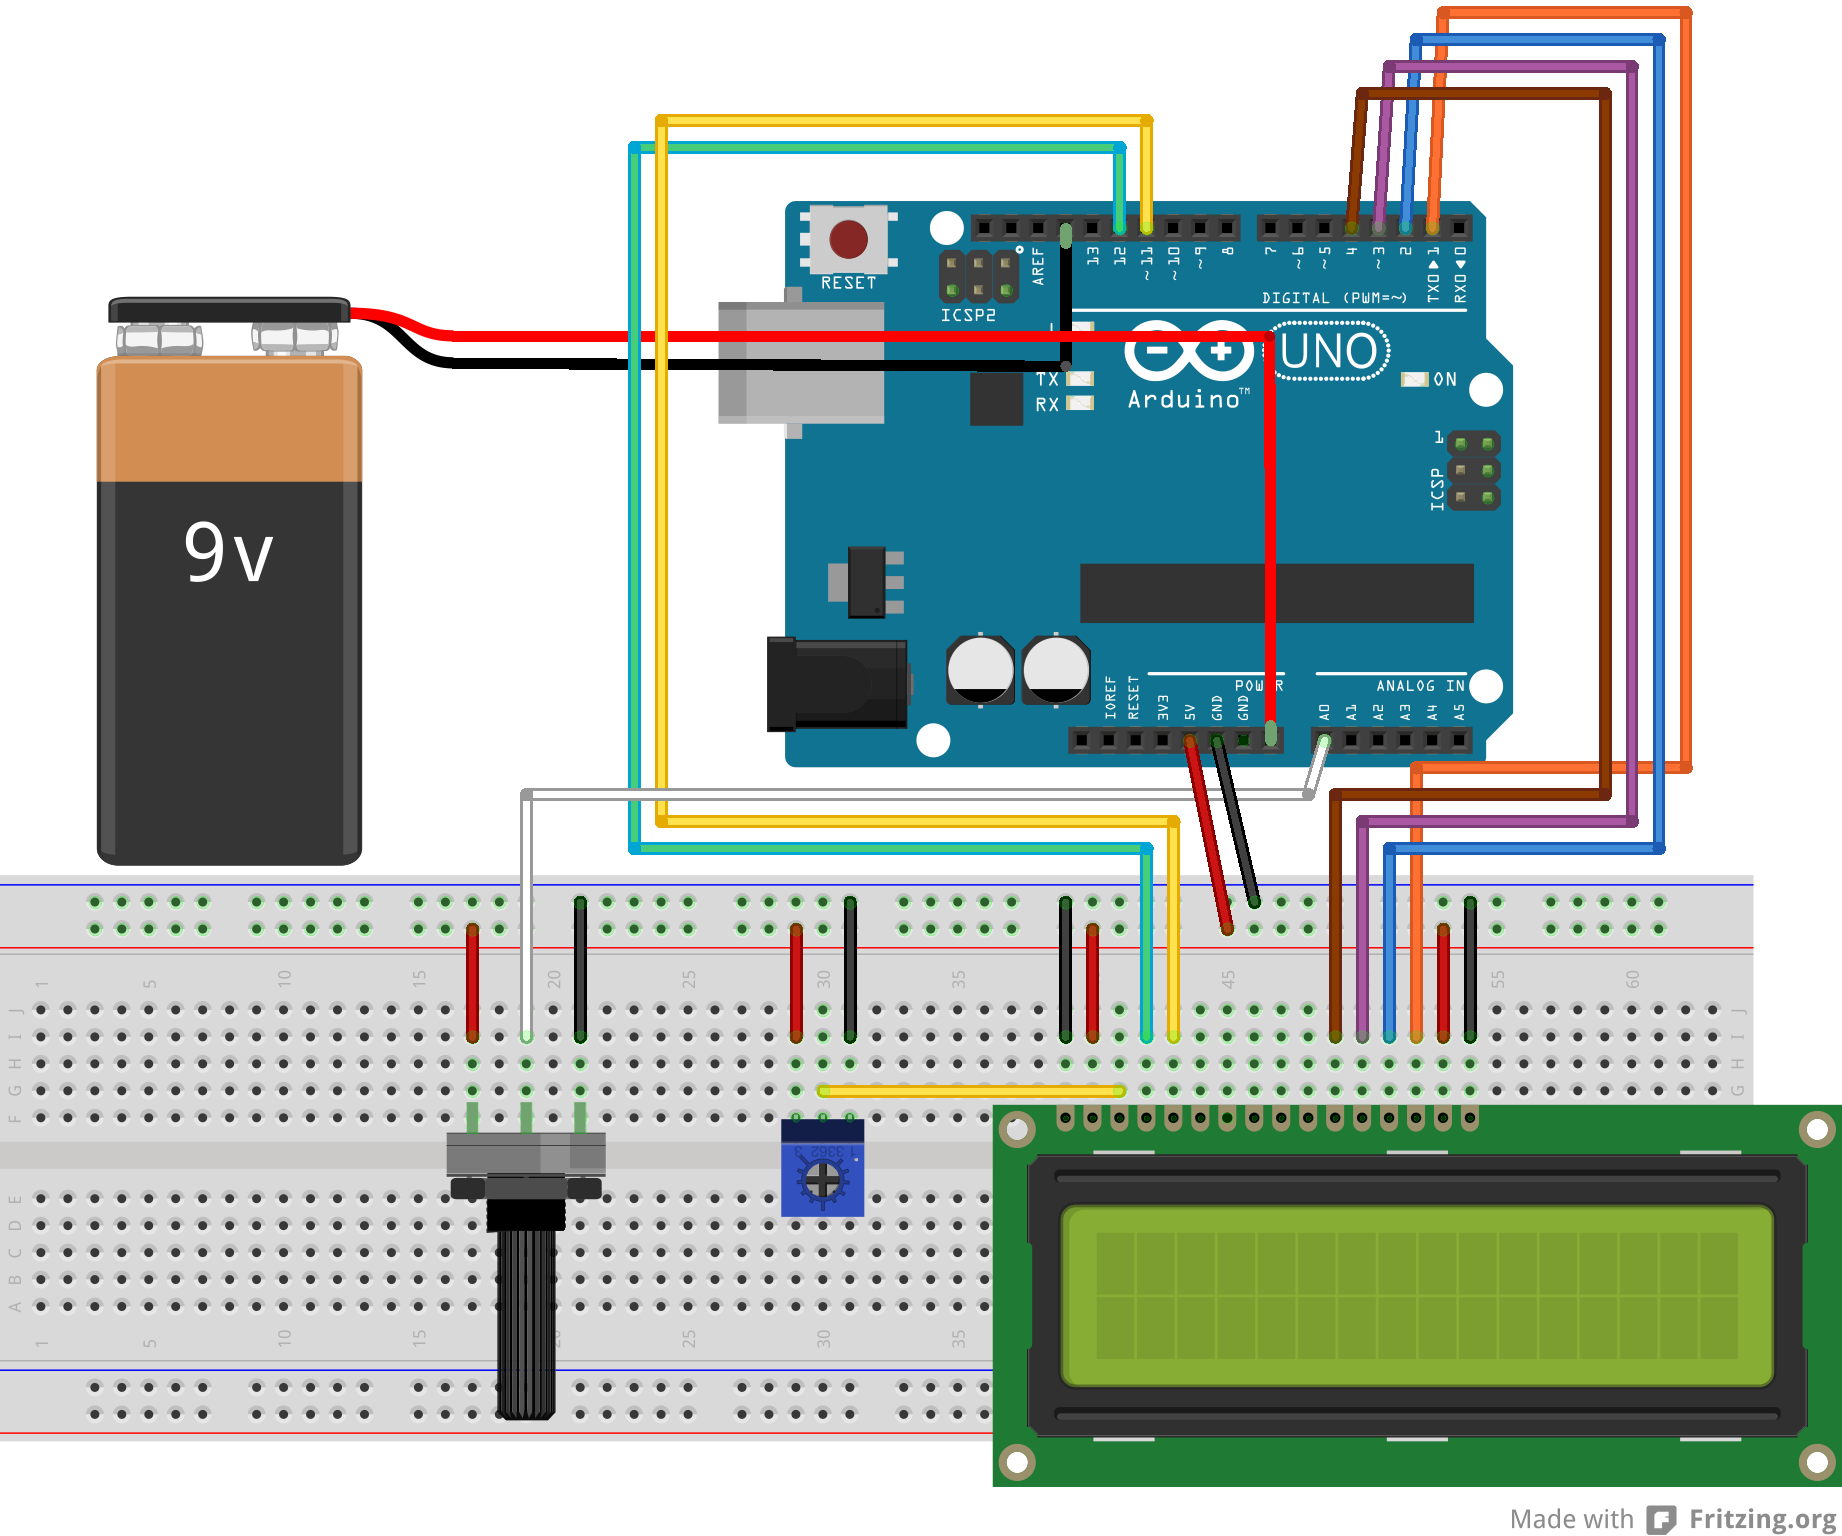 arduino uno - How to read pH value - Arduino Stack